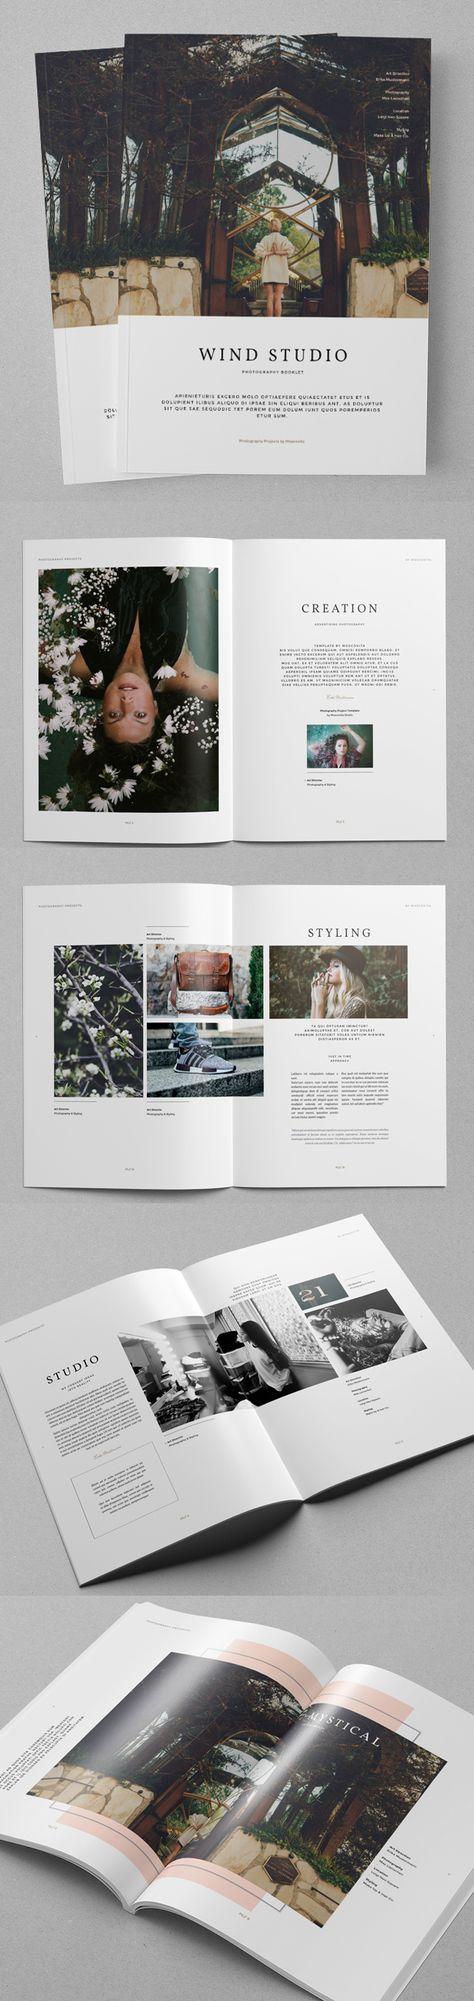 17 New Creative Brochure / Catalog Templates